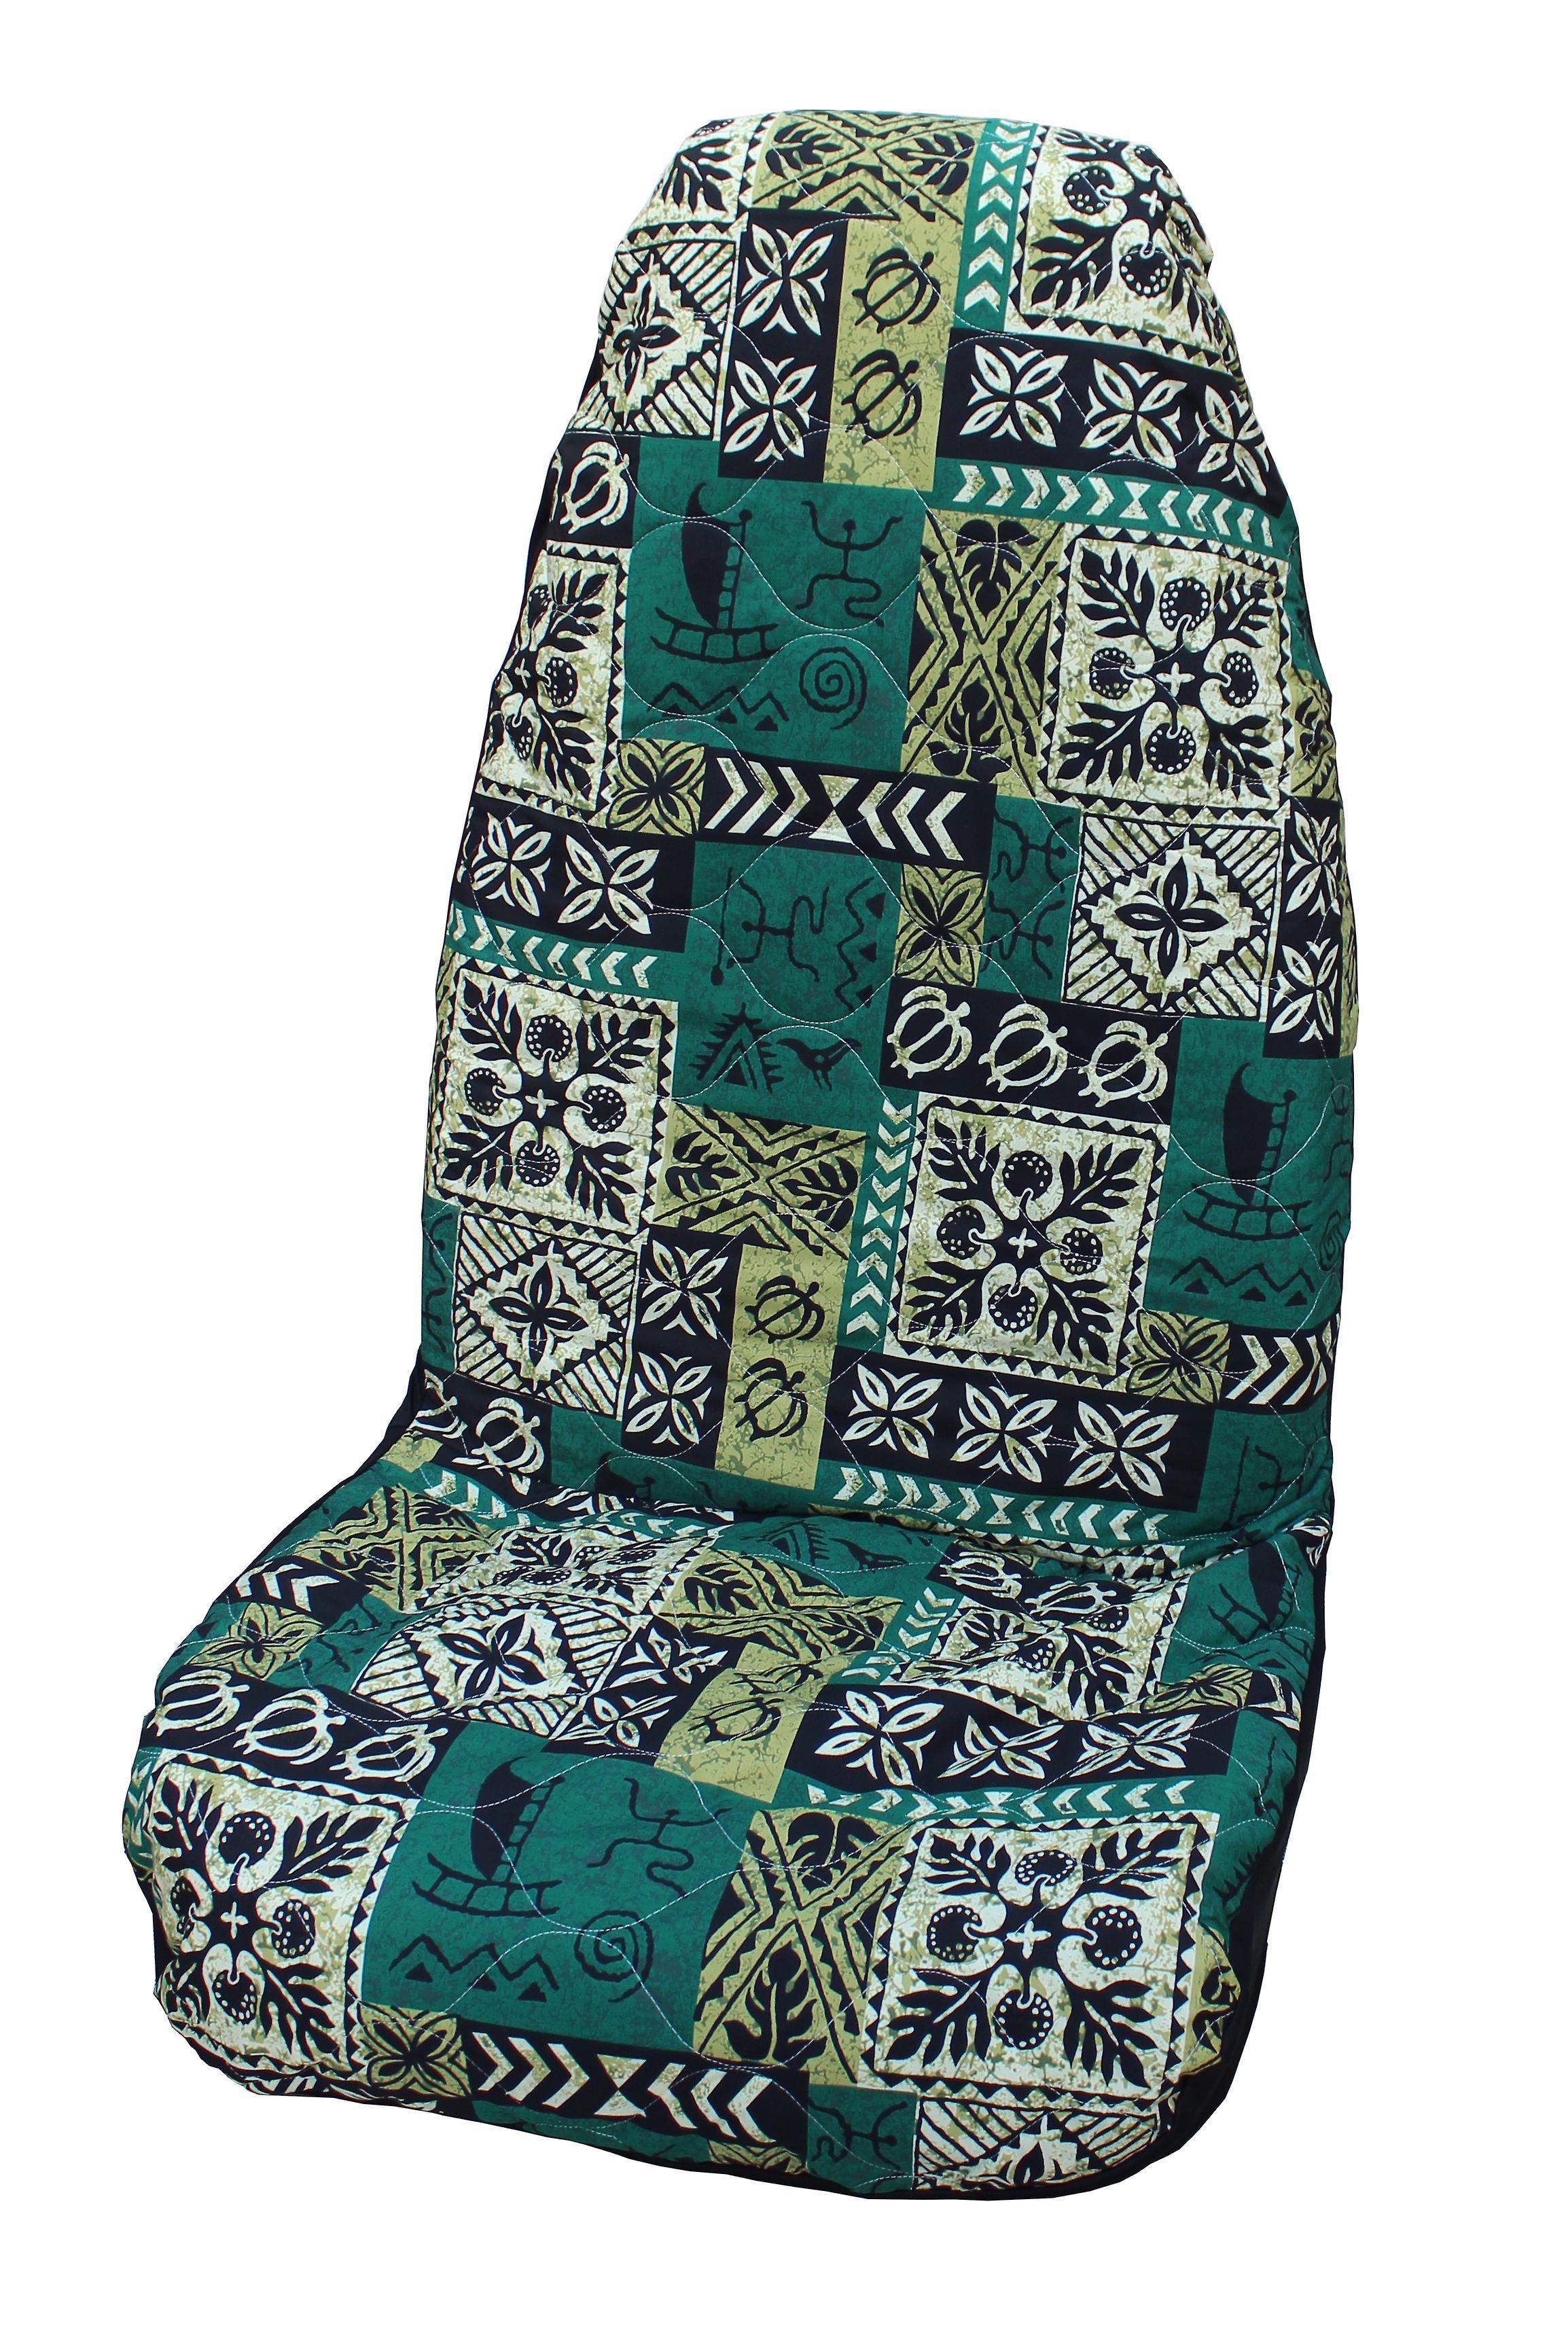 Side Airbag Optional; Old Tapa Hawaiian Car Seat Covers